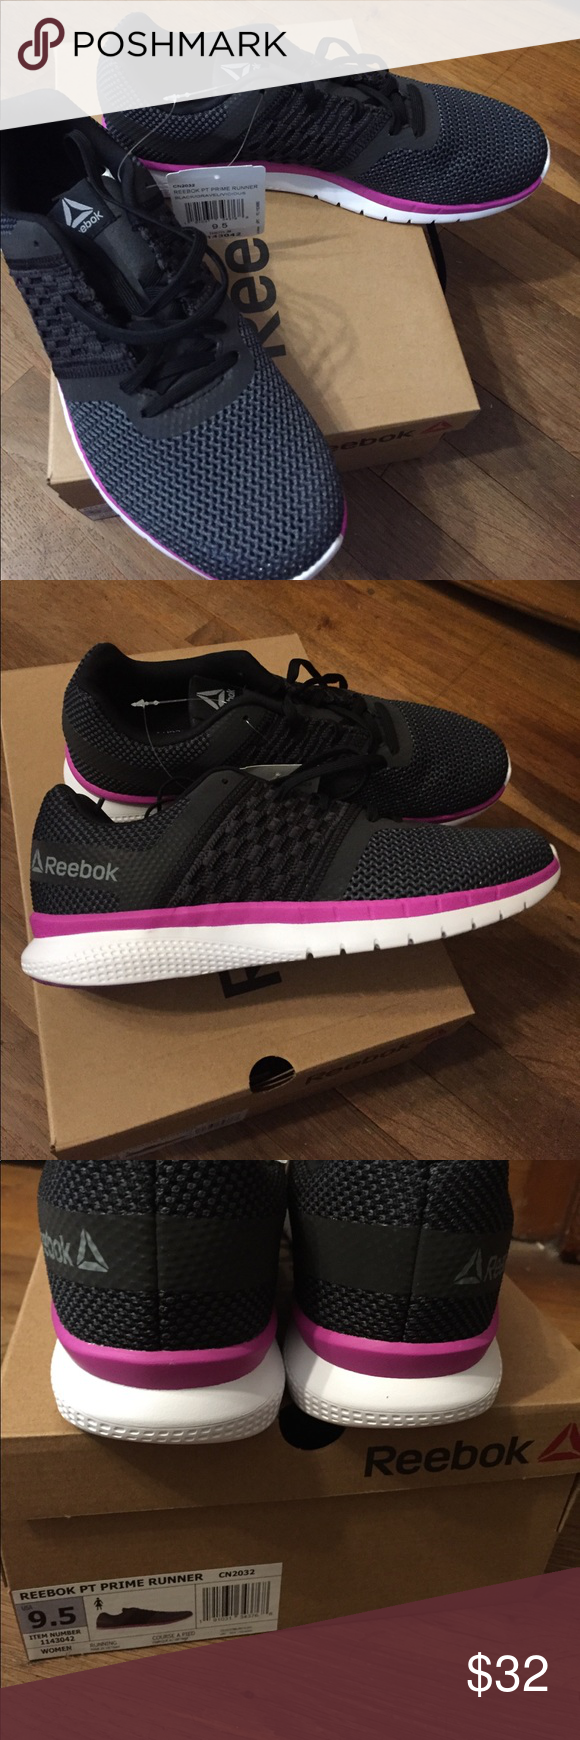 944d40a0c0a Reebok Running Shoes Lightweight Narrow fit Reebok Shoes Sneakers ...